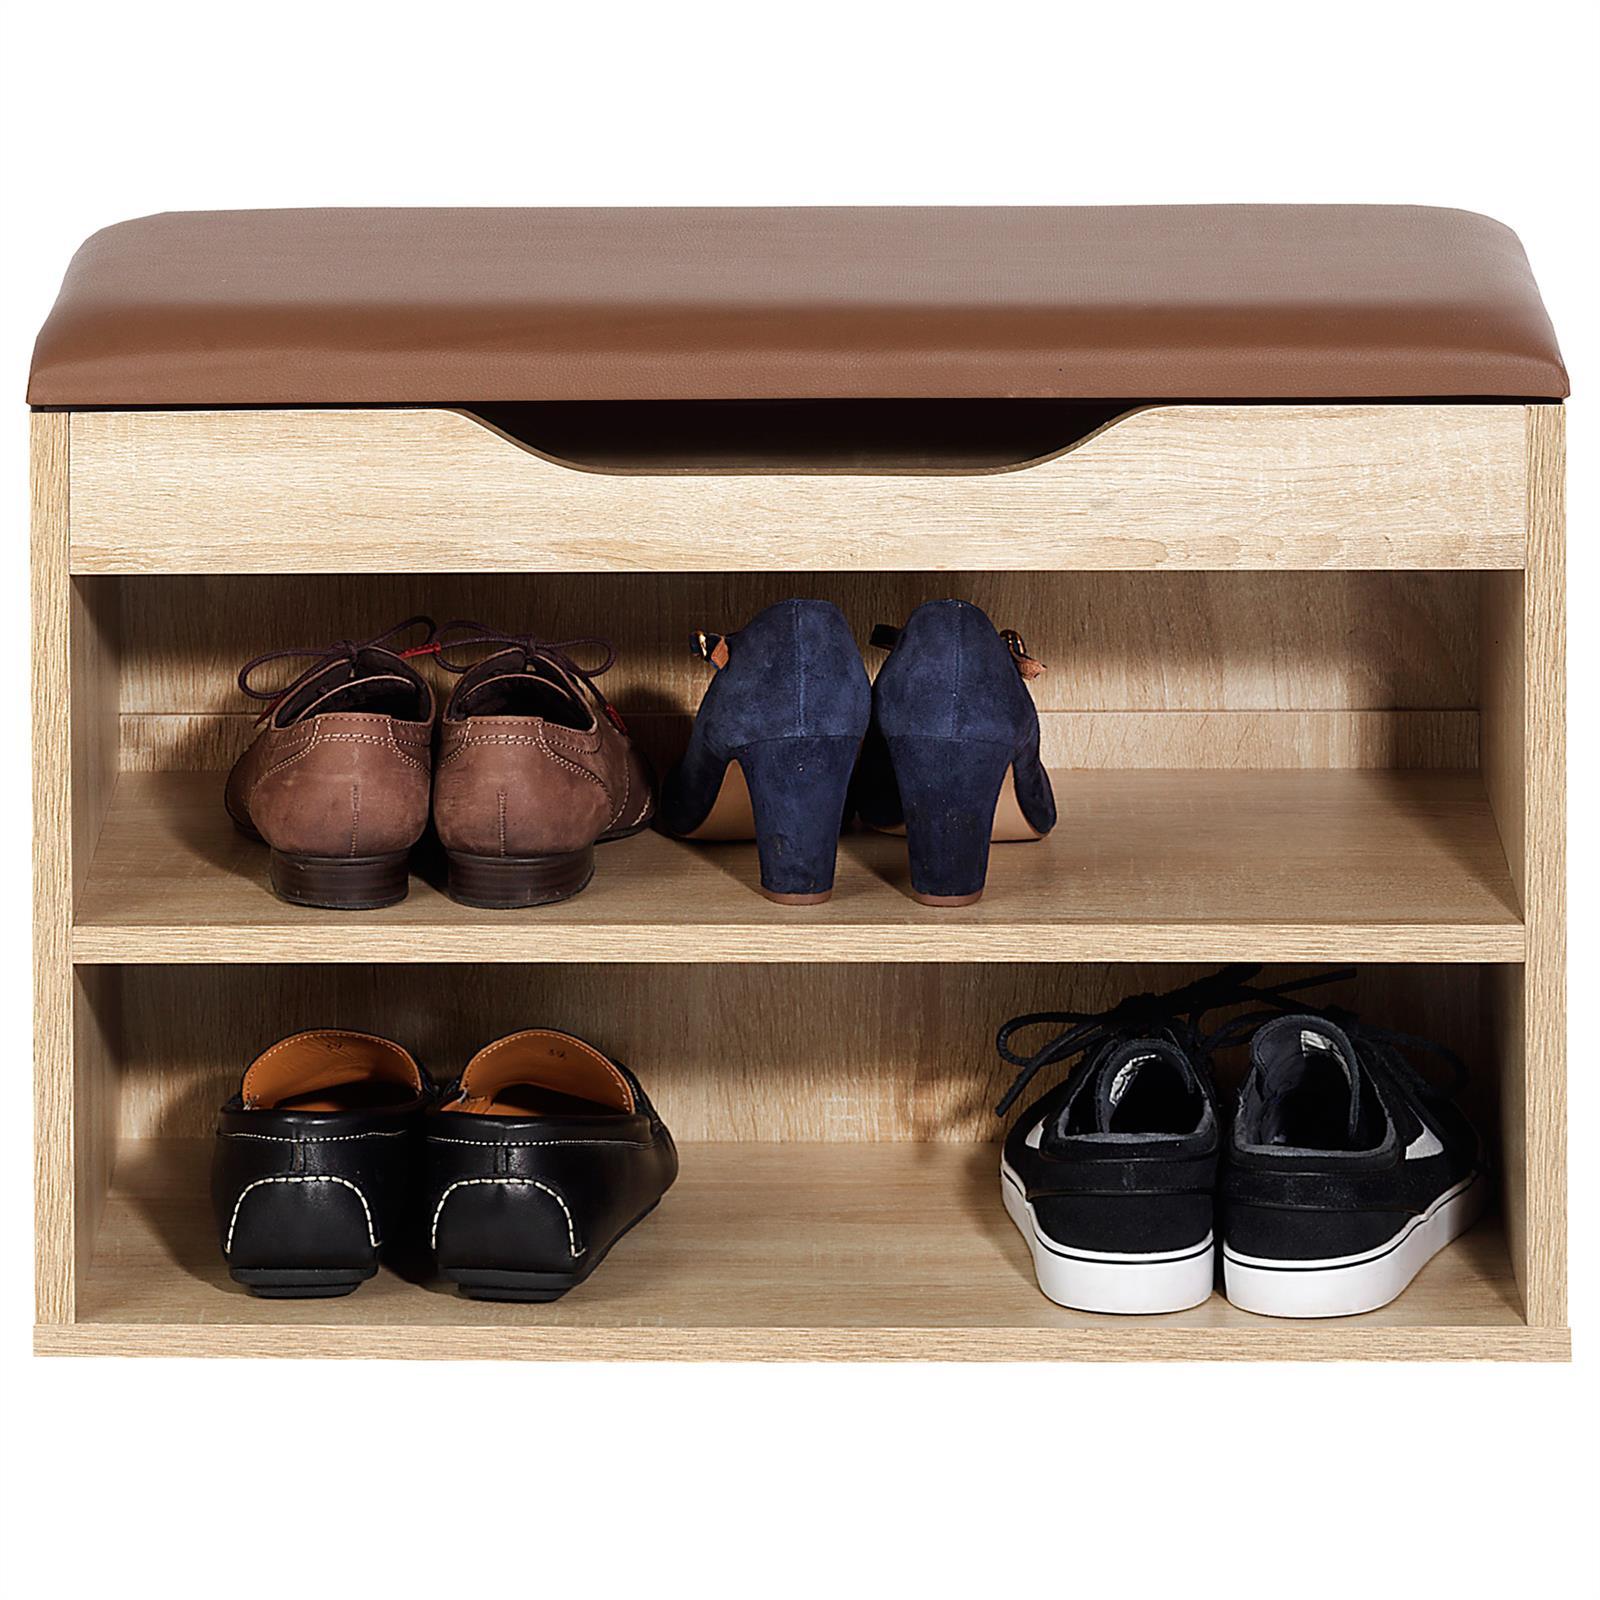 schuhbank sitzbank truhe schuhregal mit kissen 6 paar - Schuhregale Setzen Schuh Kollektion